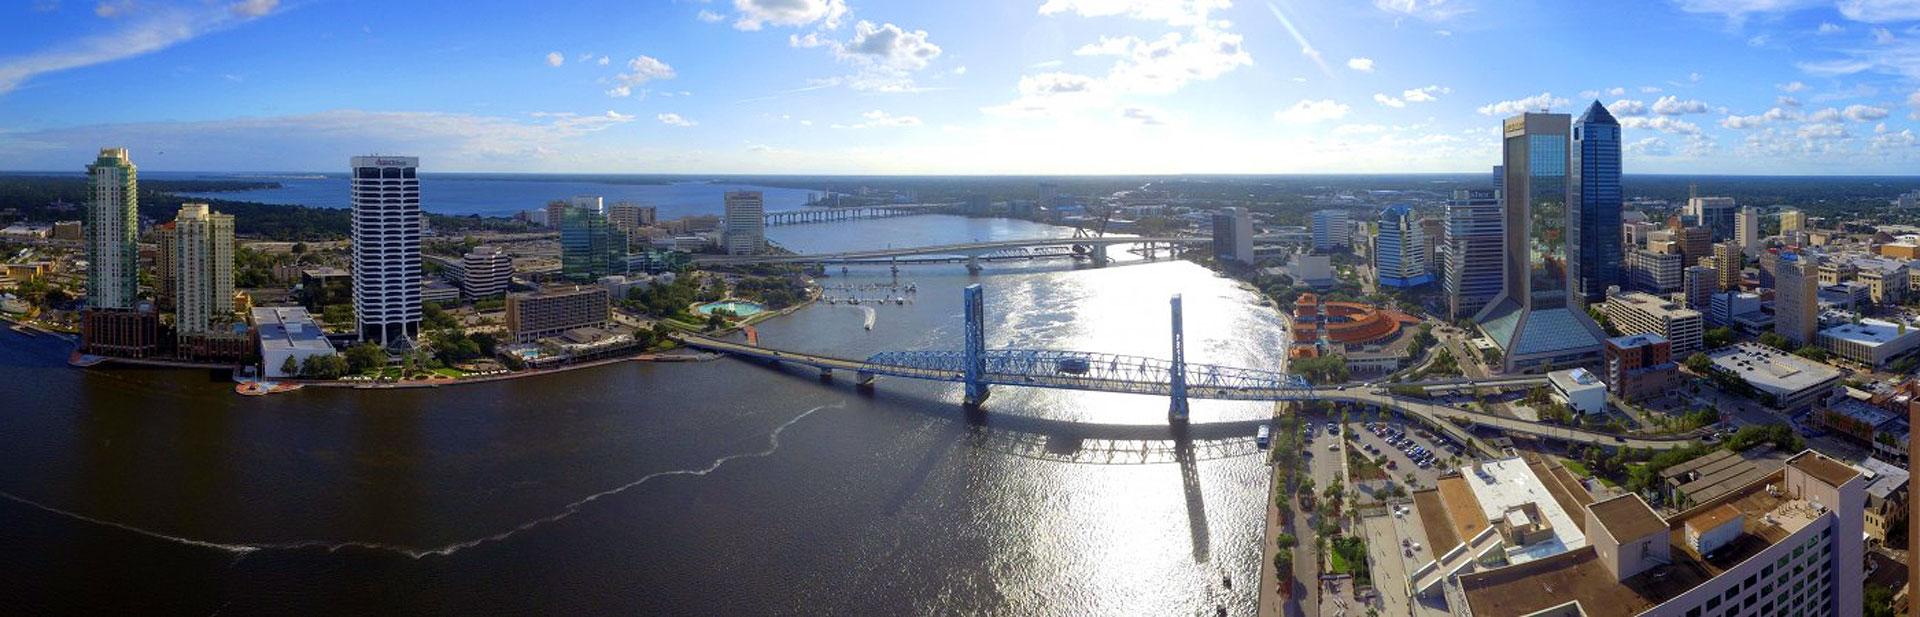 Ocala, Gainesville, Jacksonville Web Design - SEO - Bright Green Path